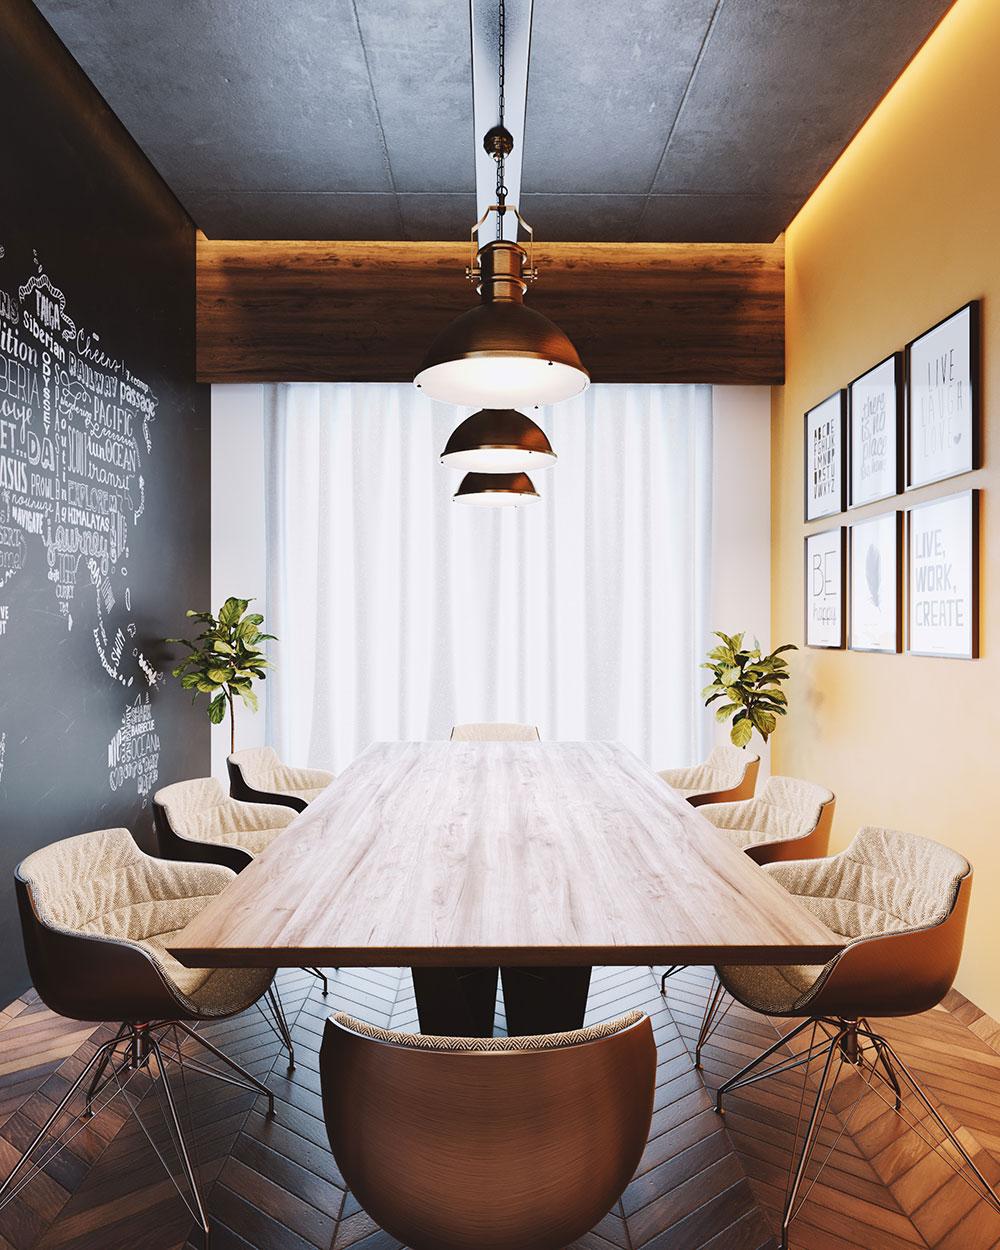 3D Architectural Interior rendering service